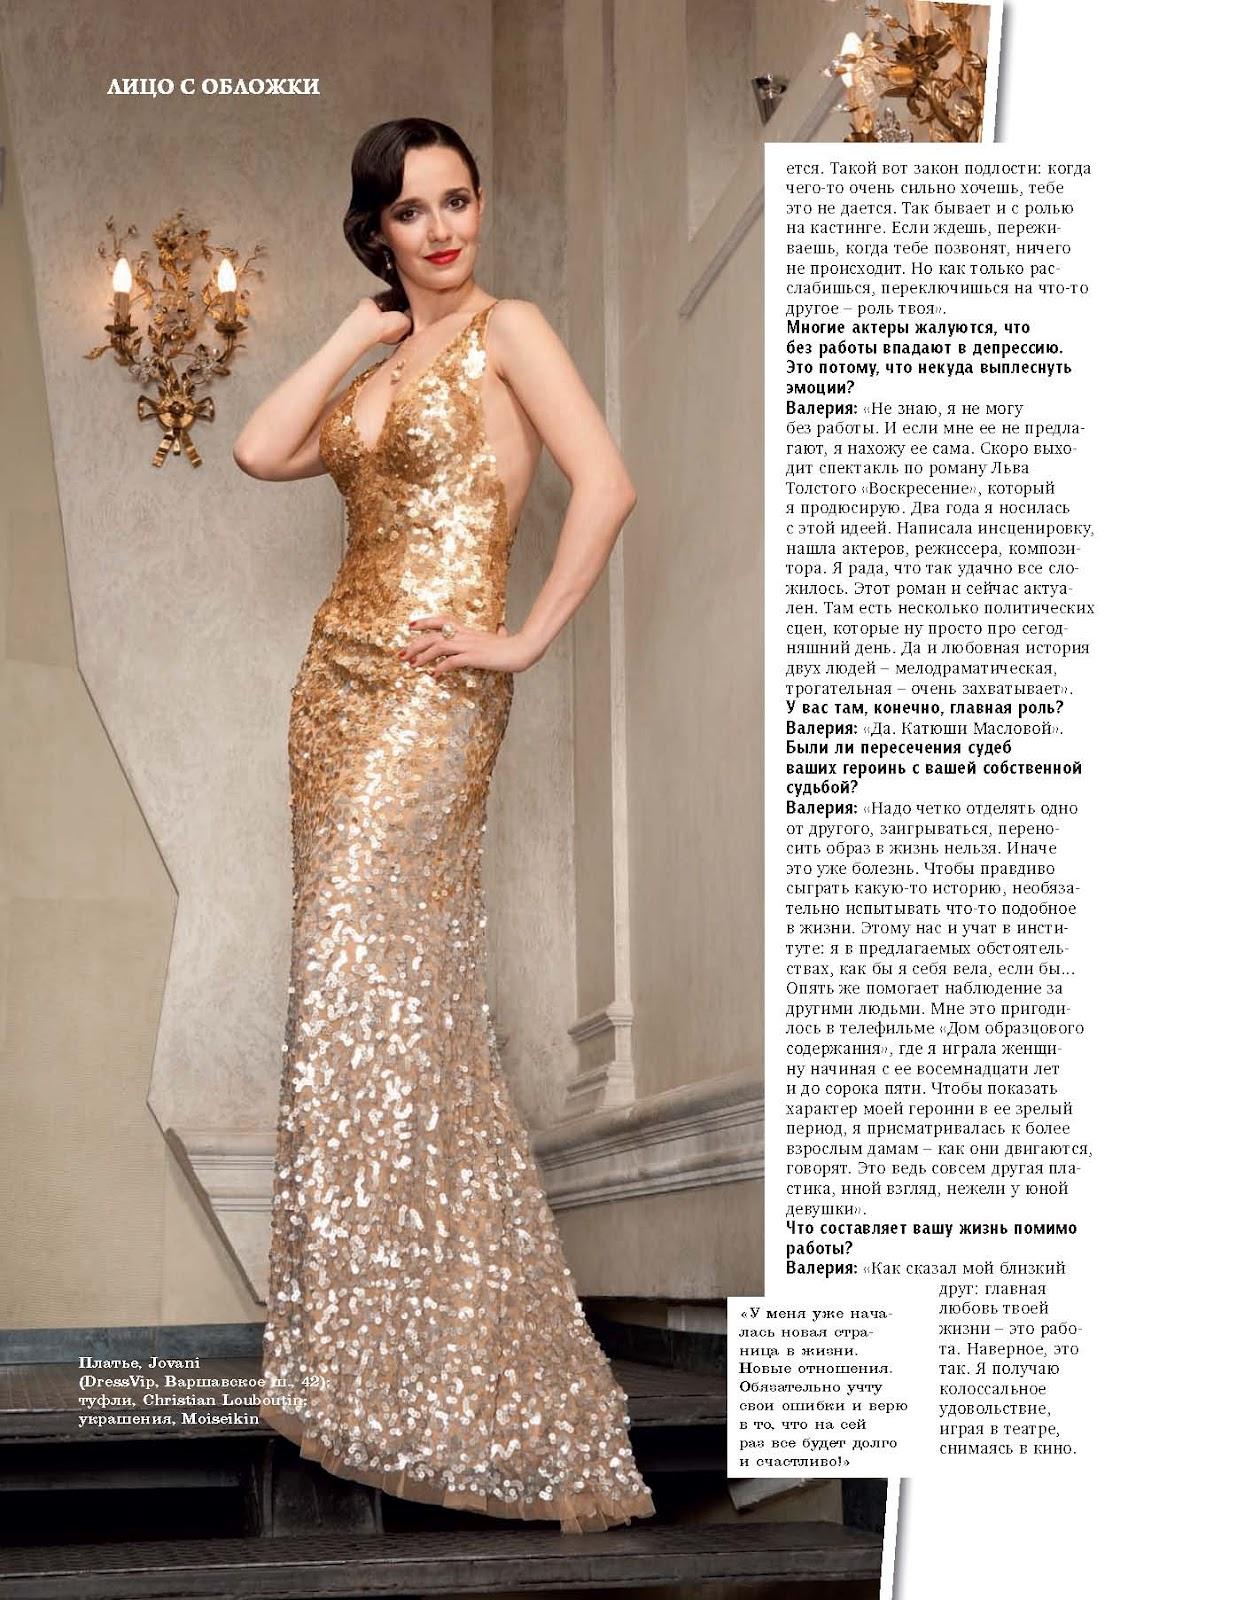 Юлия зимина фото в журнале 9 фотография